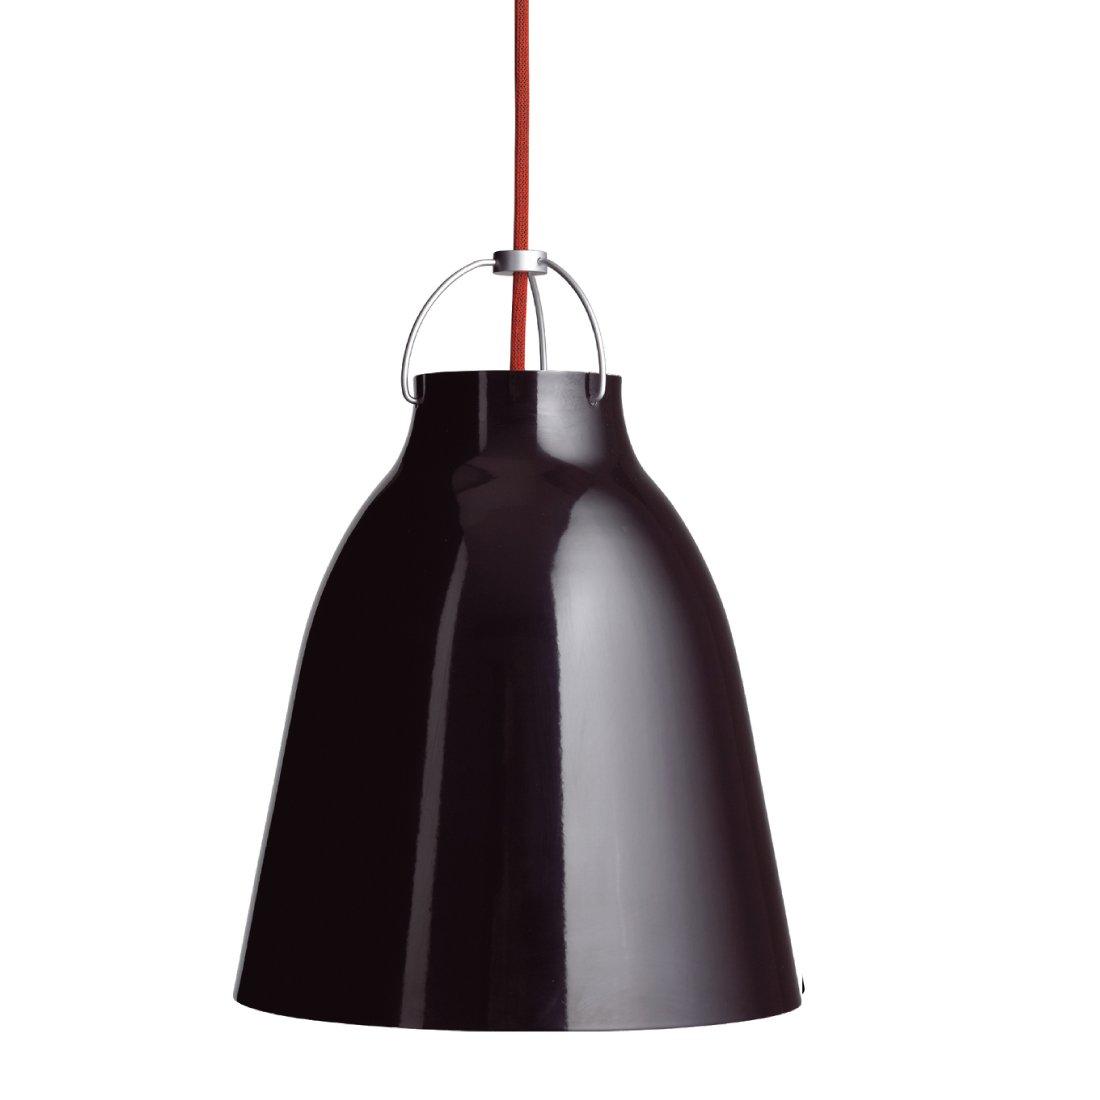 Lightyears Caravaggio P2 Hoogglans Zwart - Rood